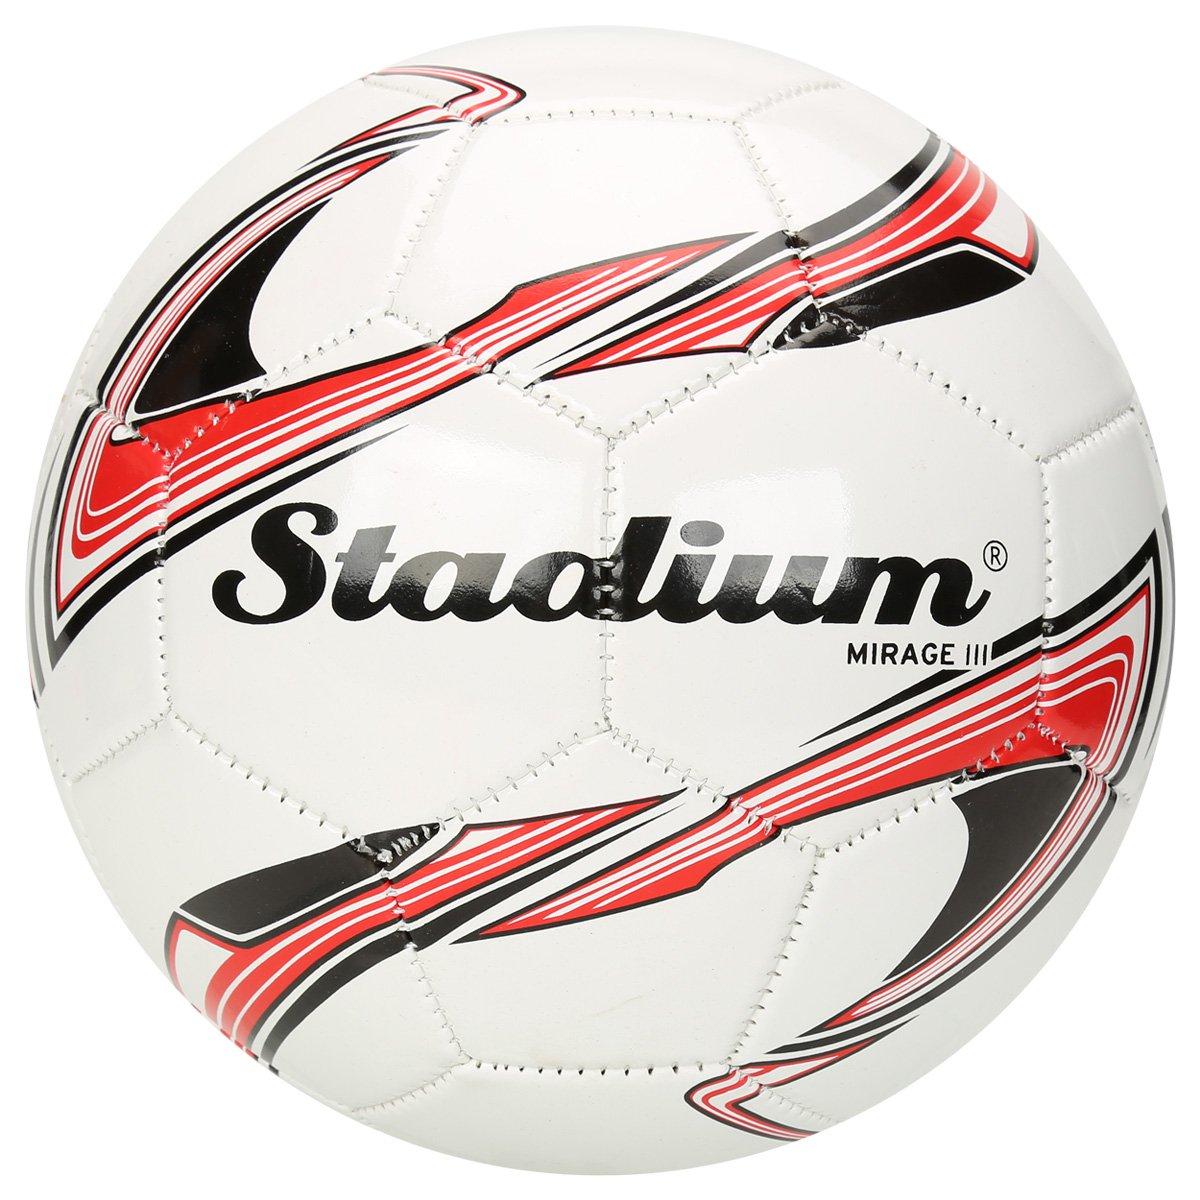 Bola Futebol Stadium Mirage 3 Campo - Compre Agora  909bc8e5eea62